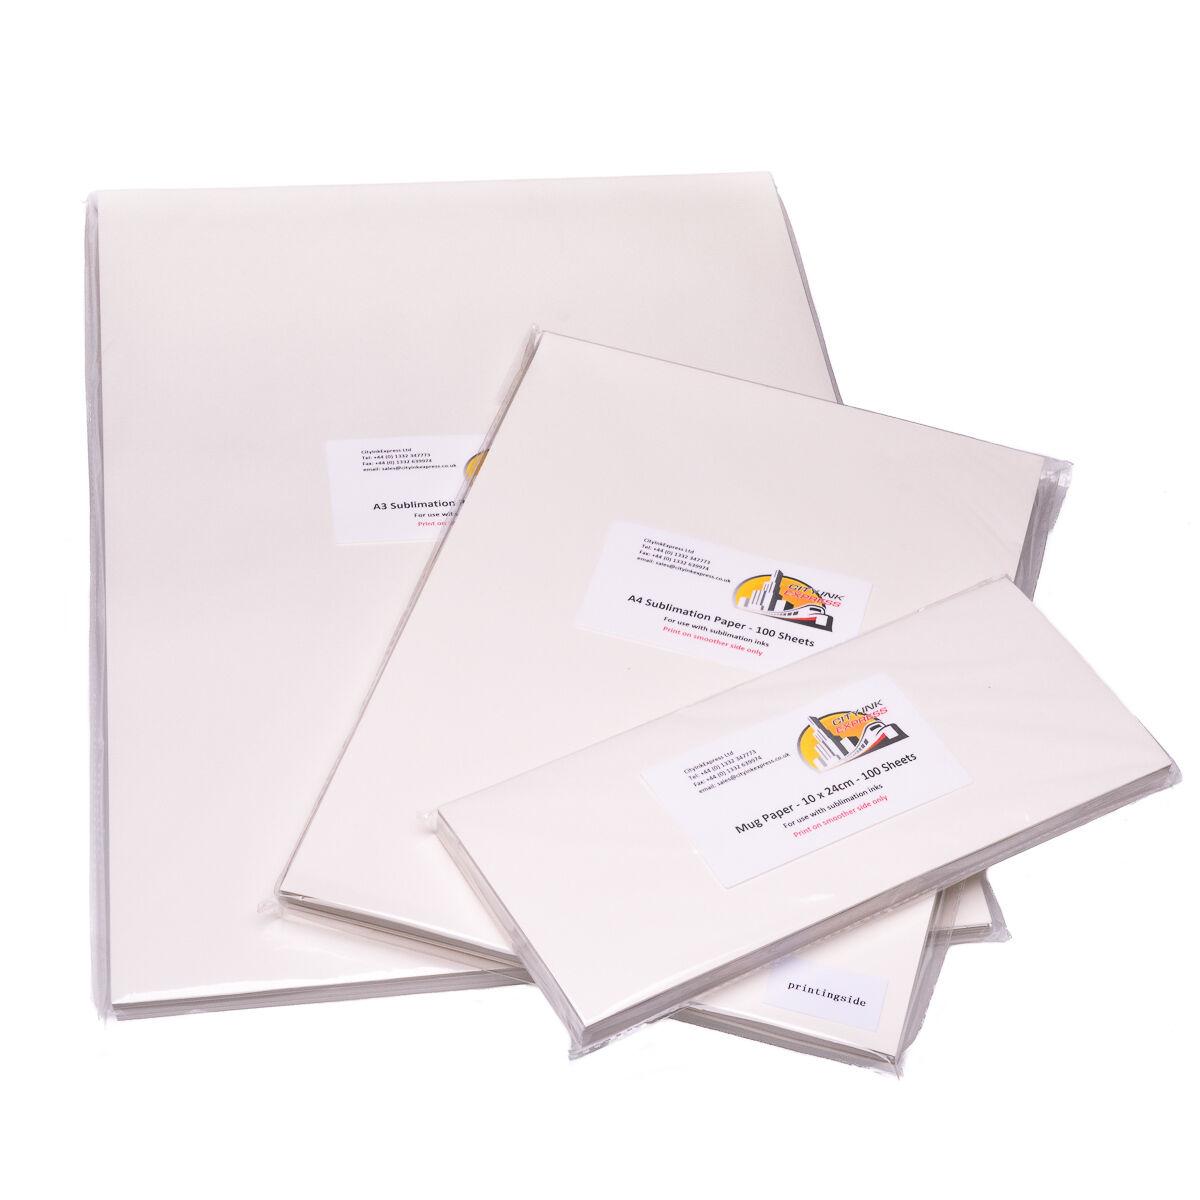 Dye Sublimation Paper for Epson ET-4750 printer